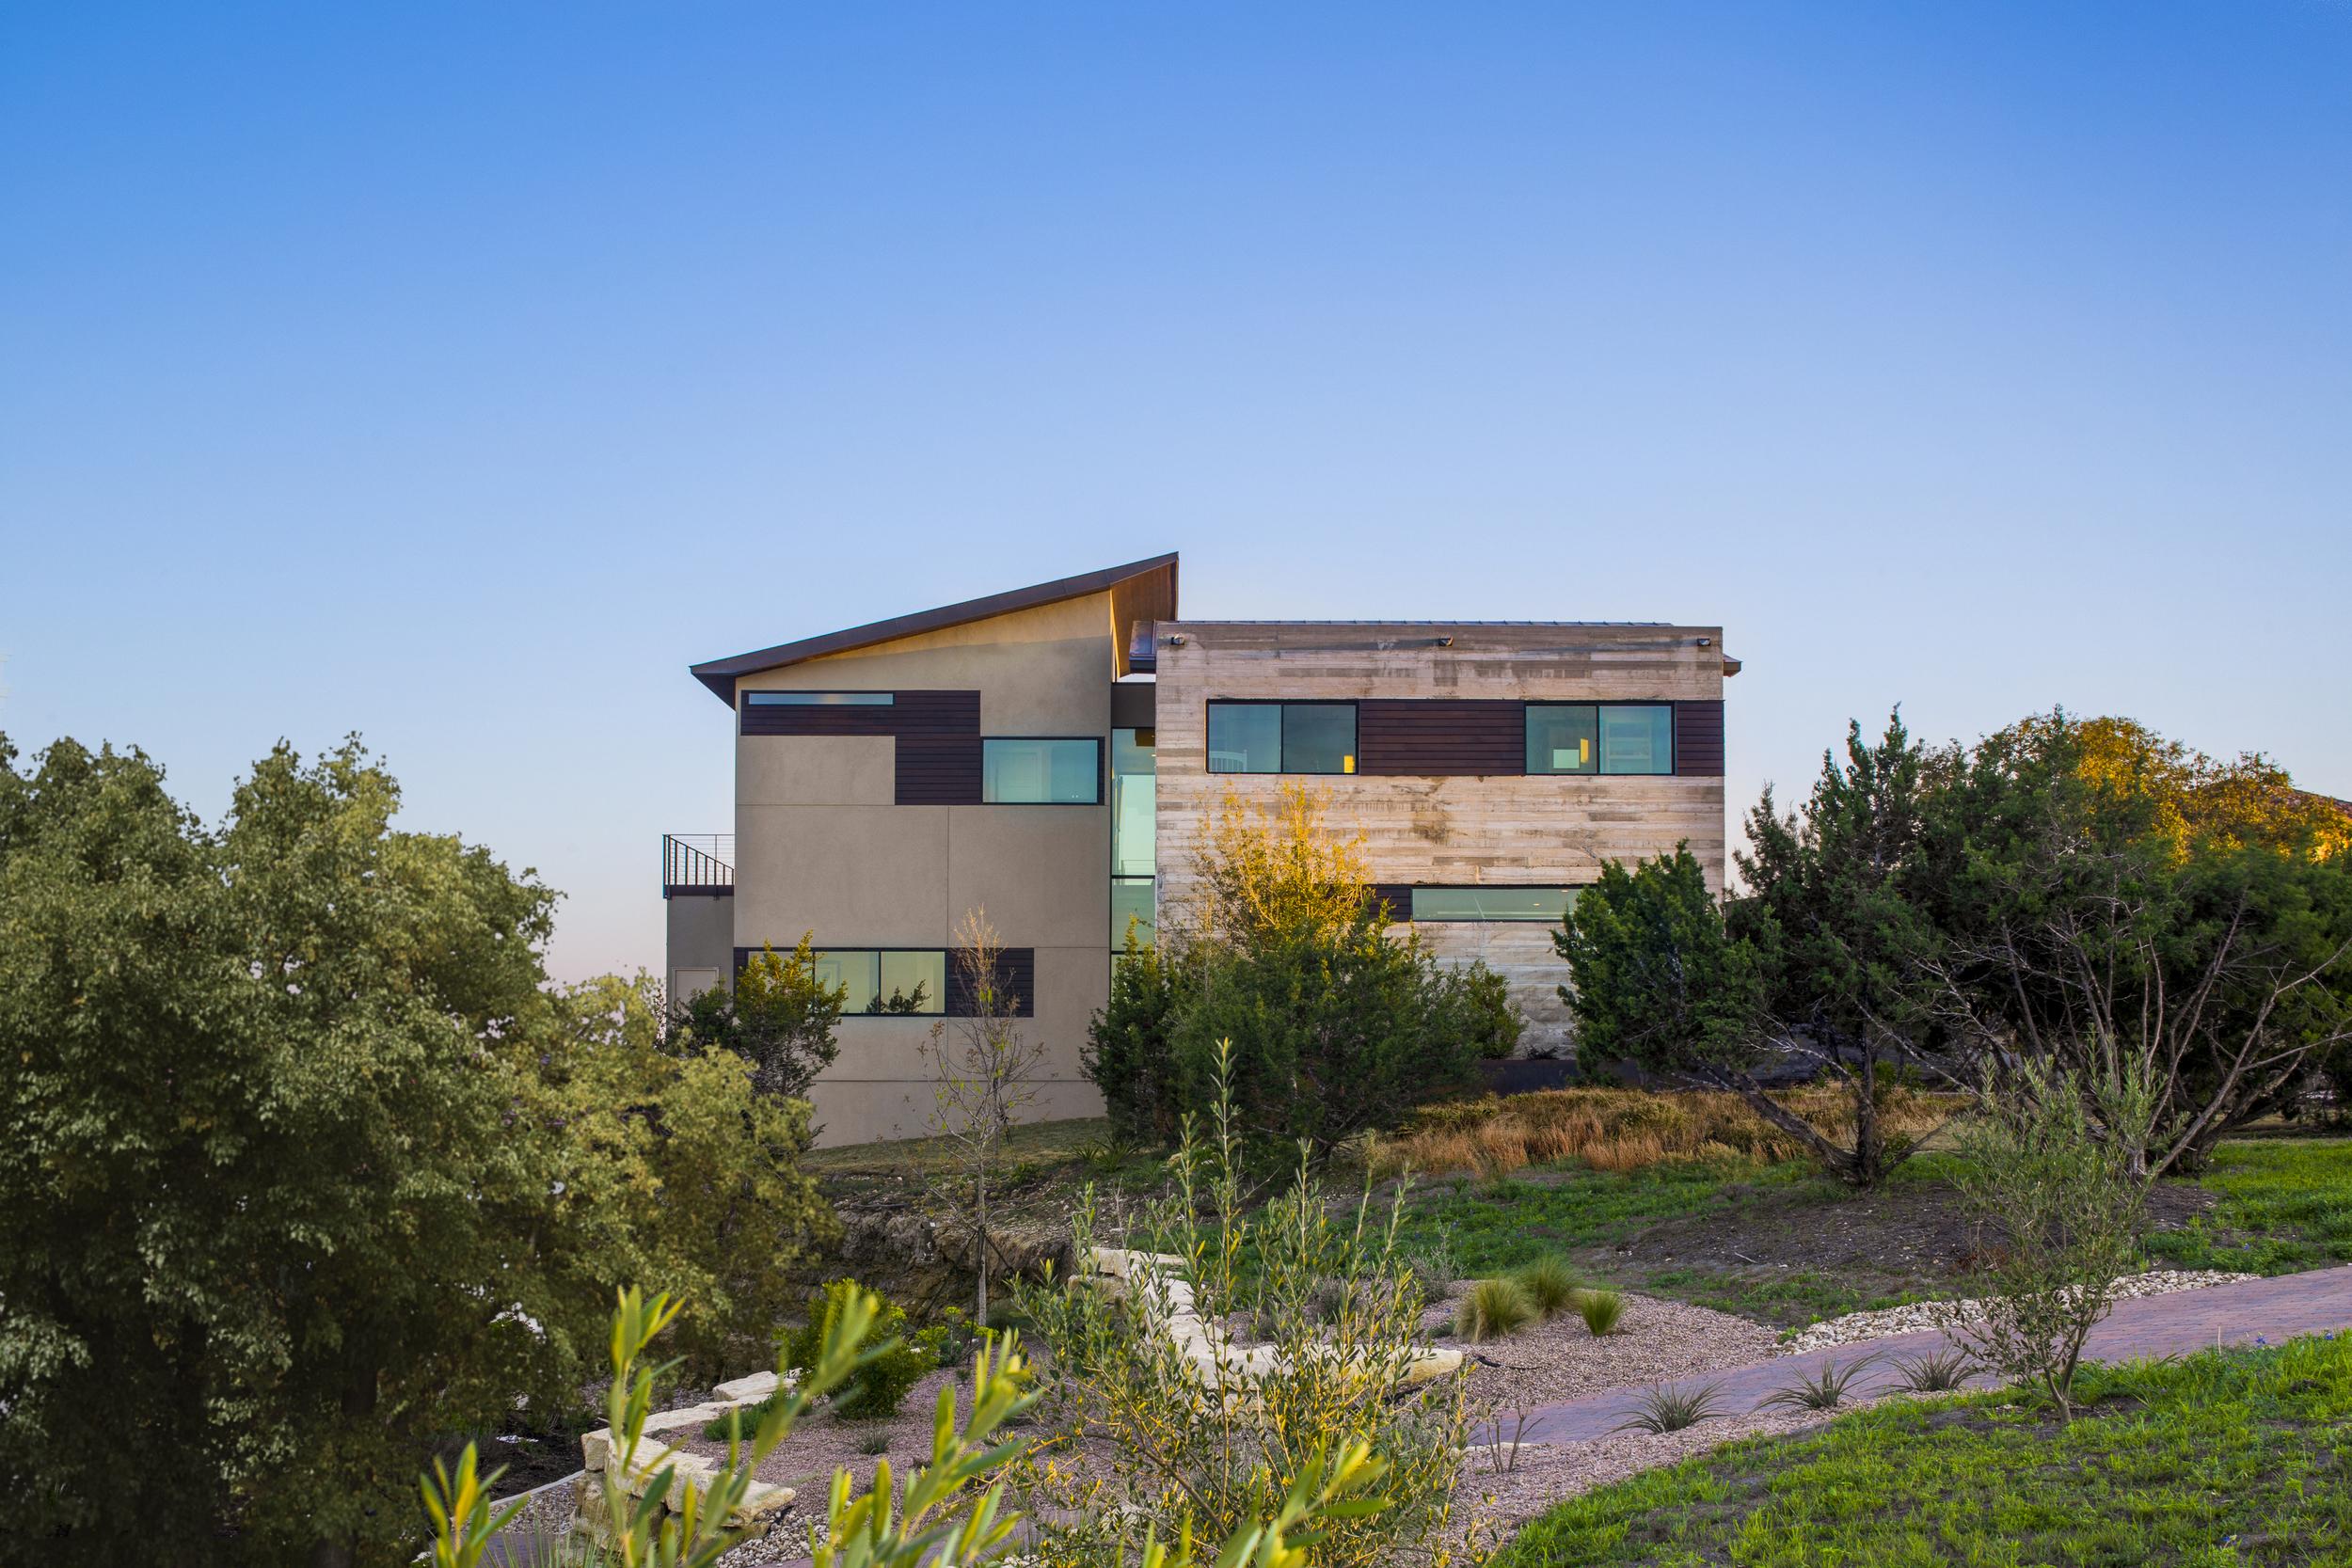 2015_0429 Matt Fajkus Architecture MF Cross Grain House 59.jpg